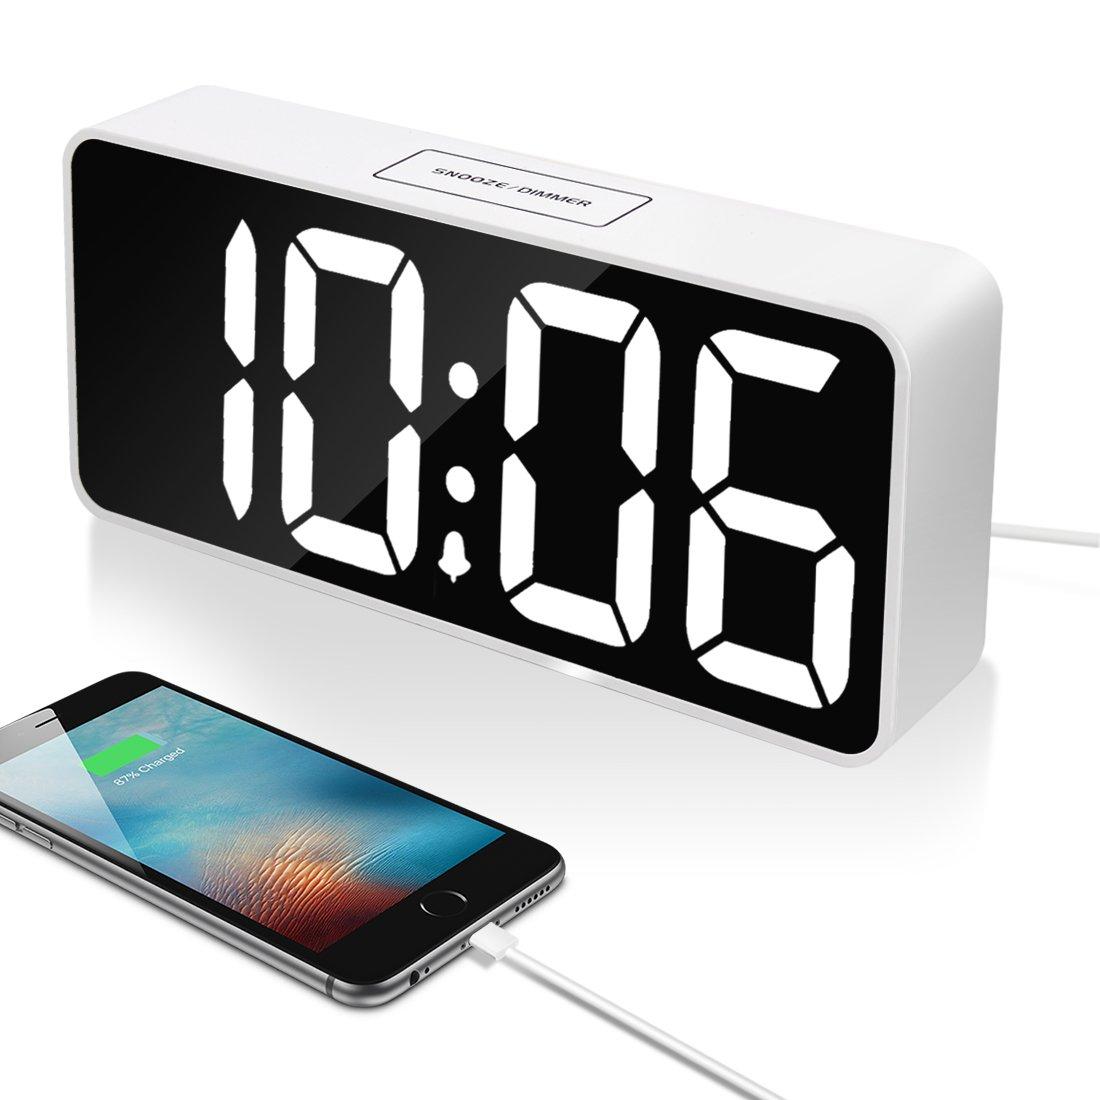 amazon com 9 large led digital alarm clock with usb port for phone rh amazon com Tropical Island Vacation Clip Art Volcano Clip Art